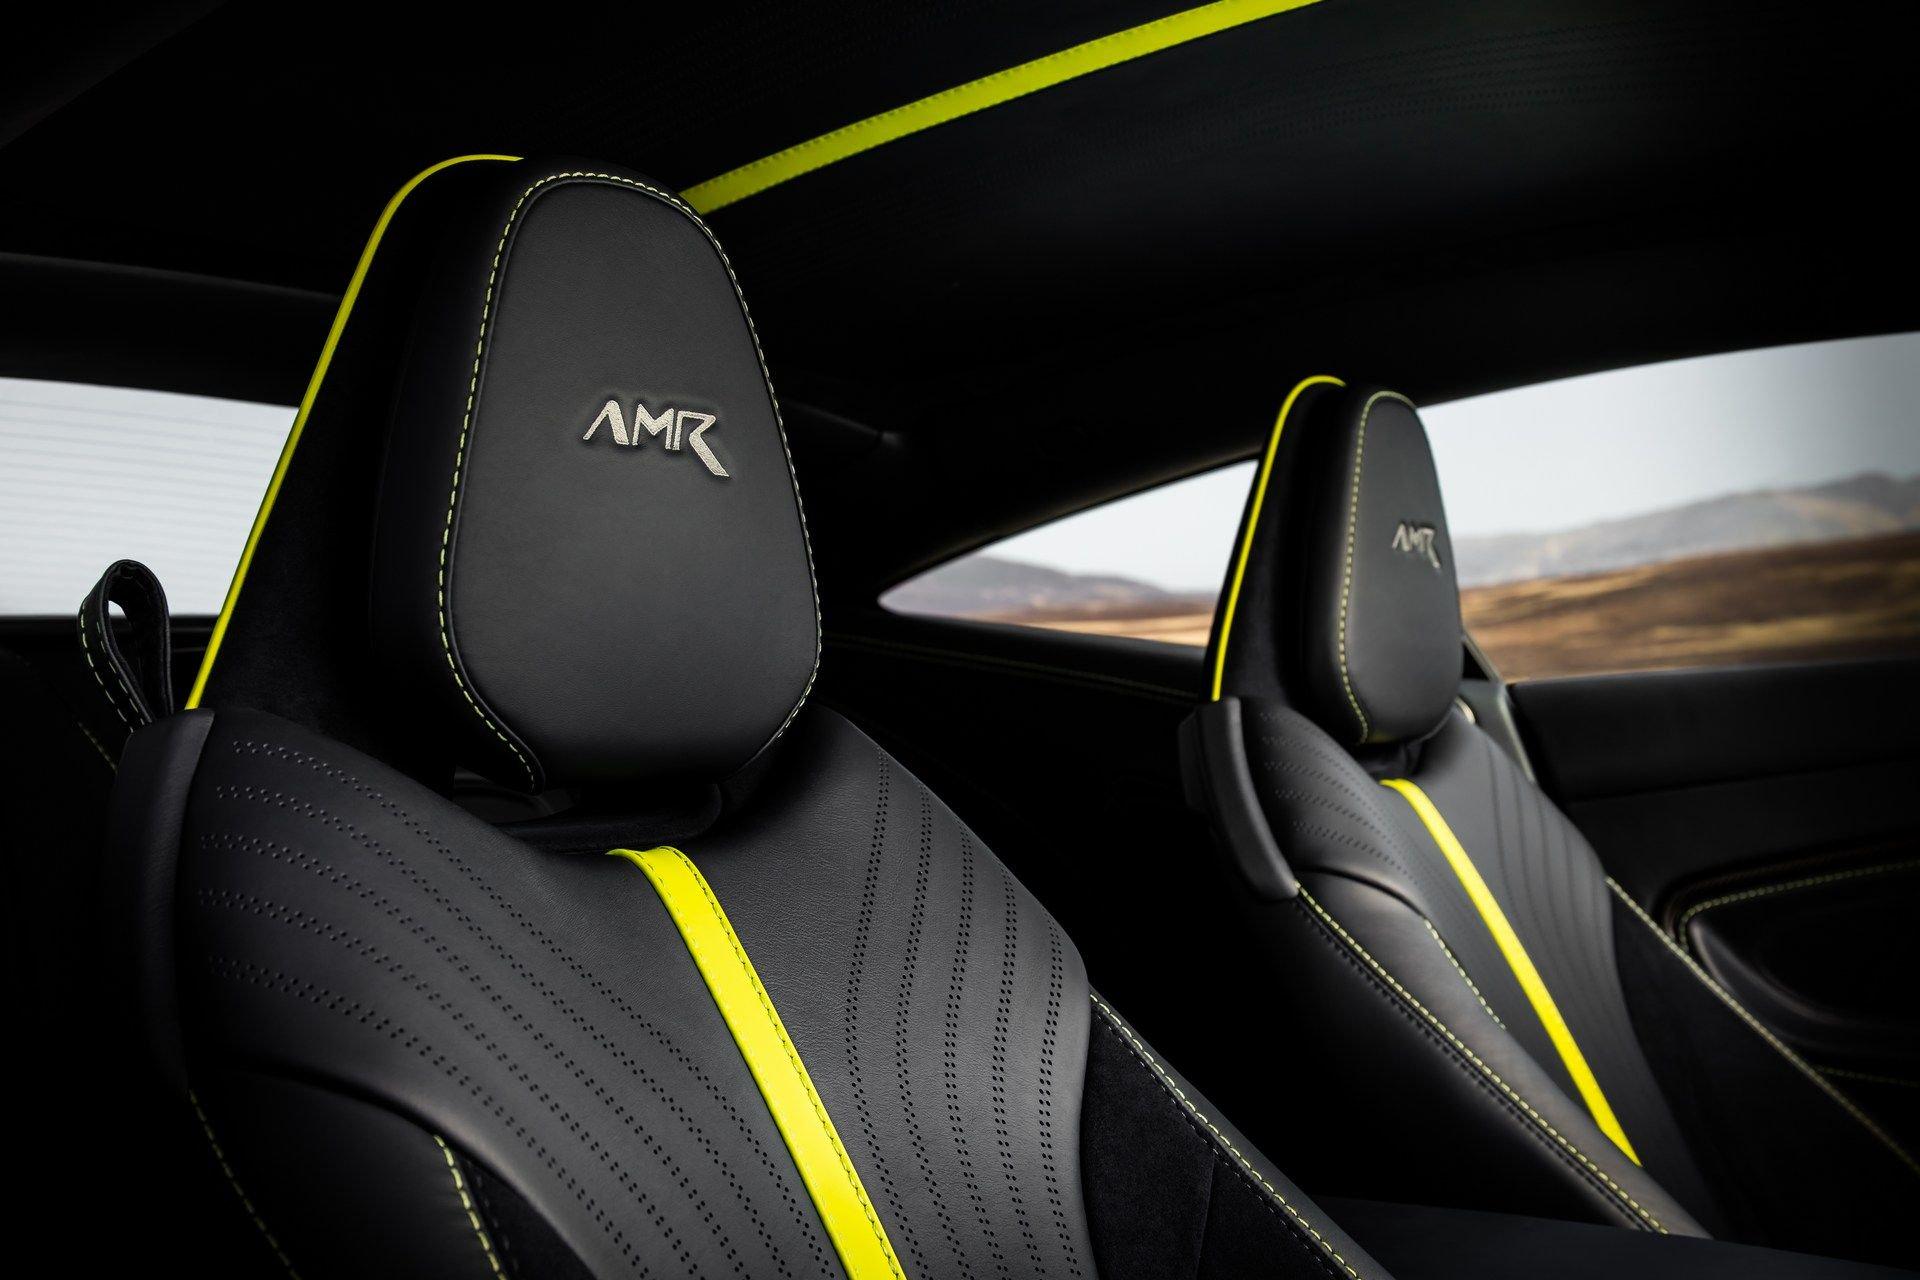 Aston-Martin-DB11-AMR-6